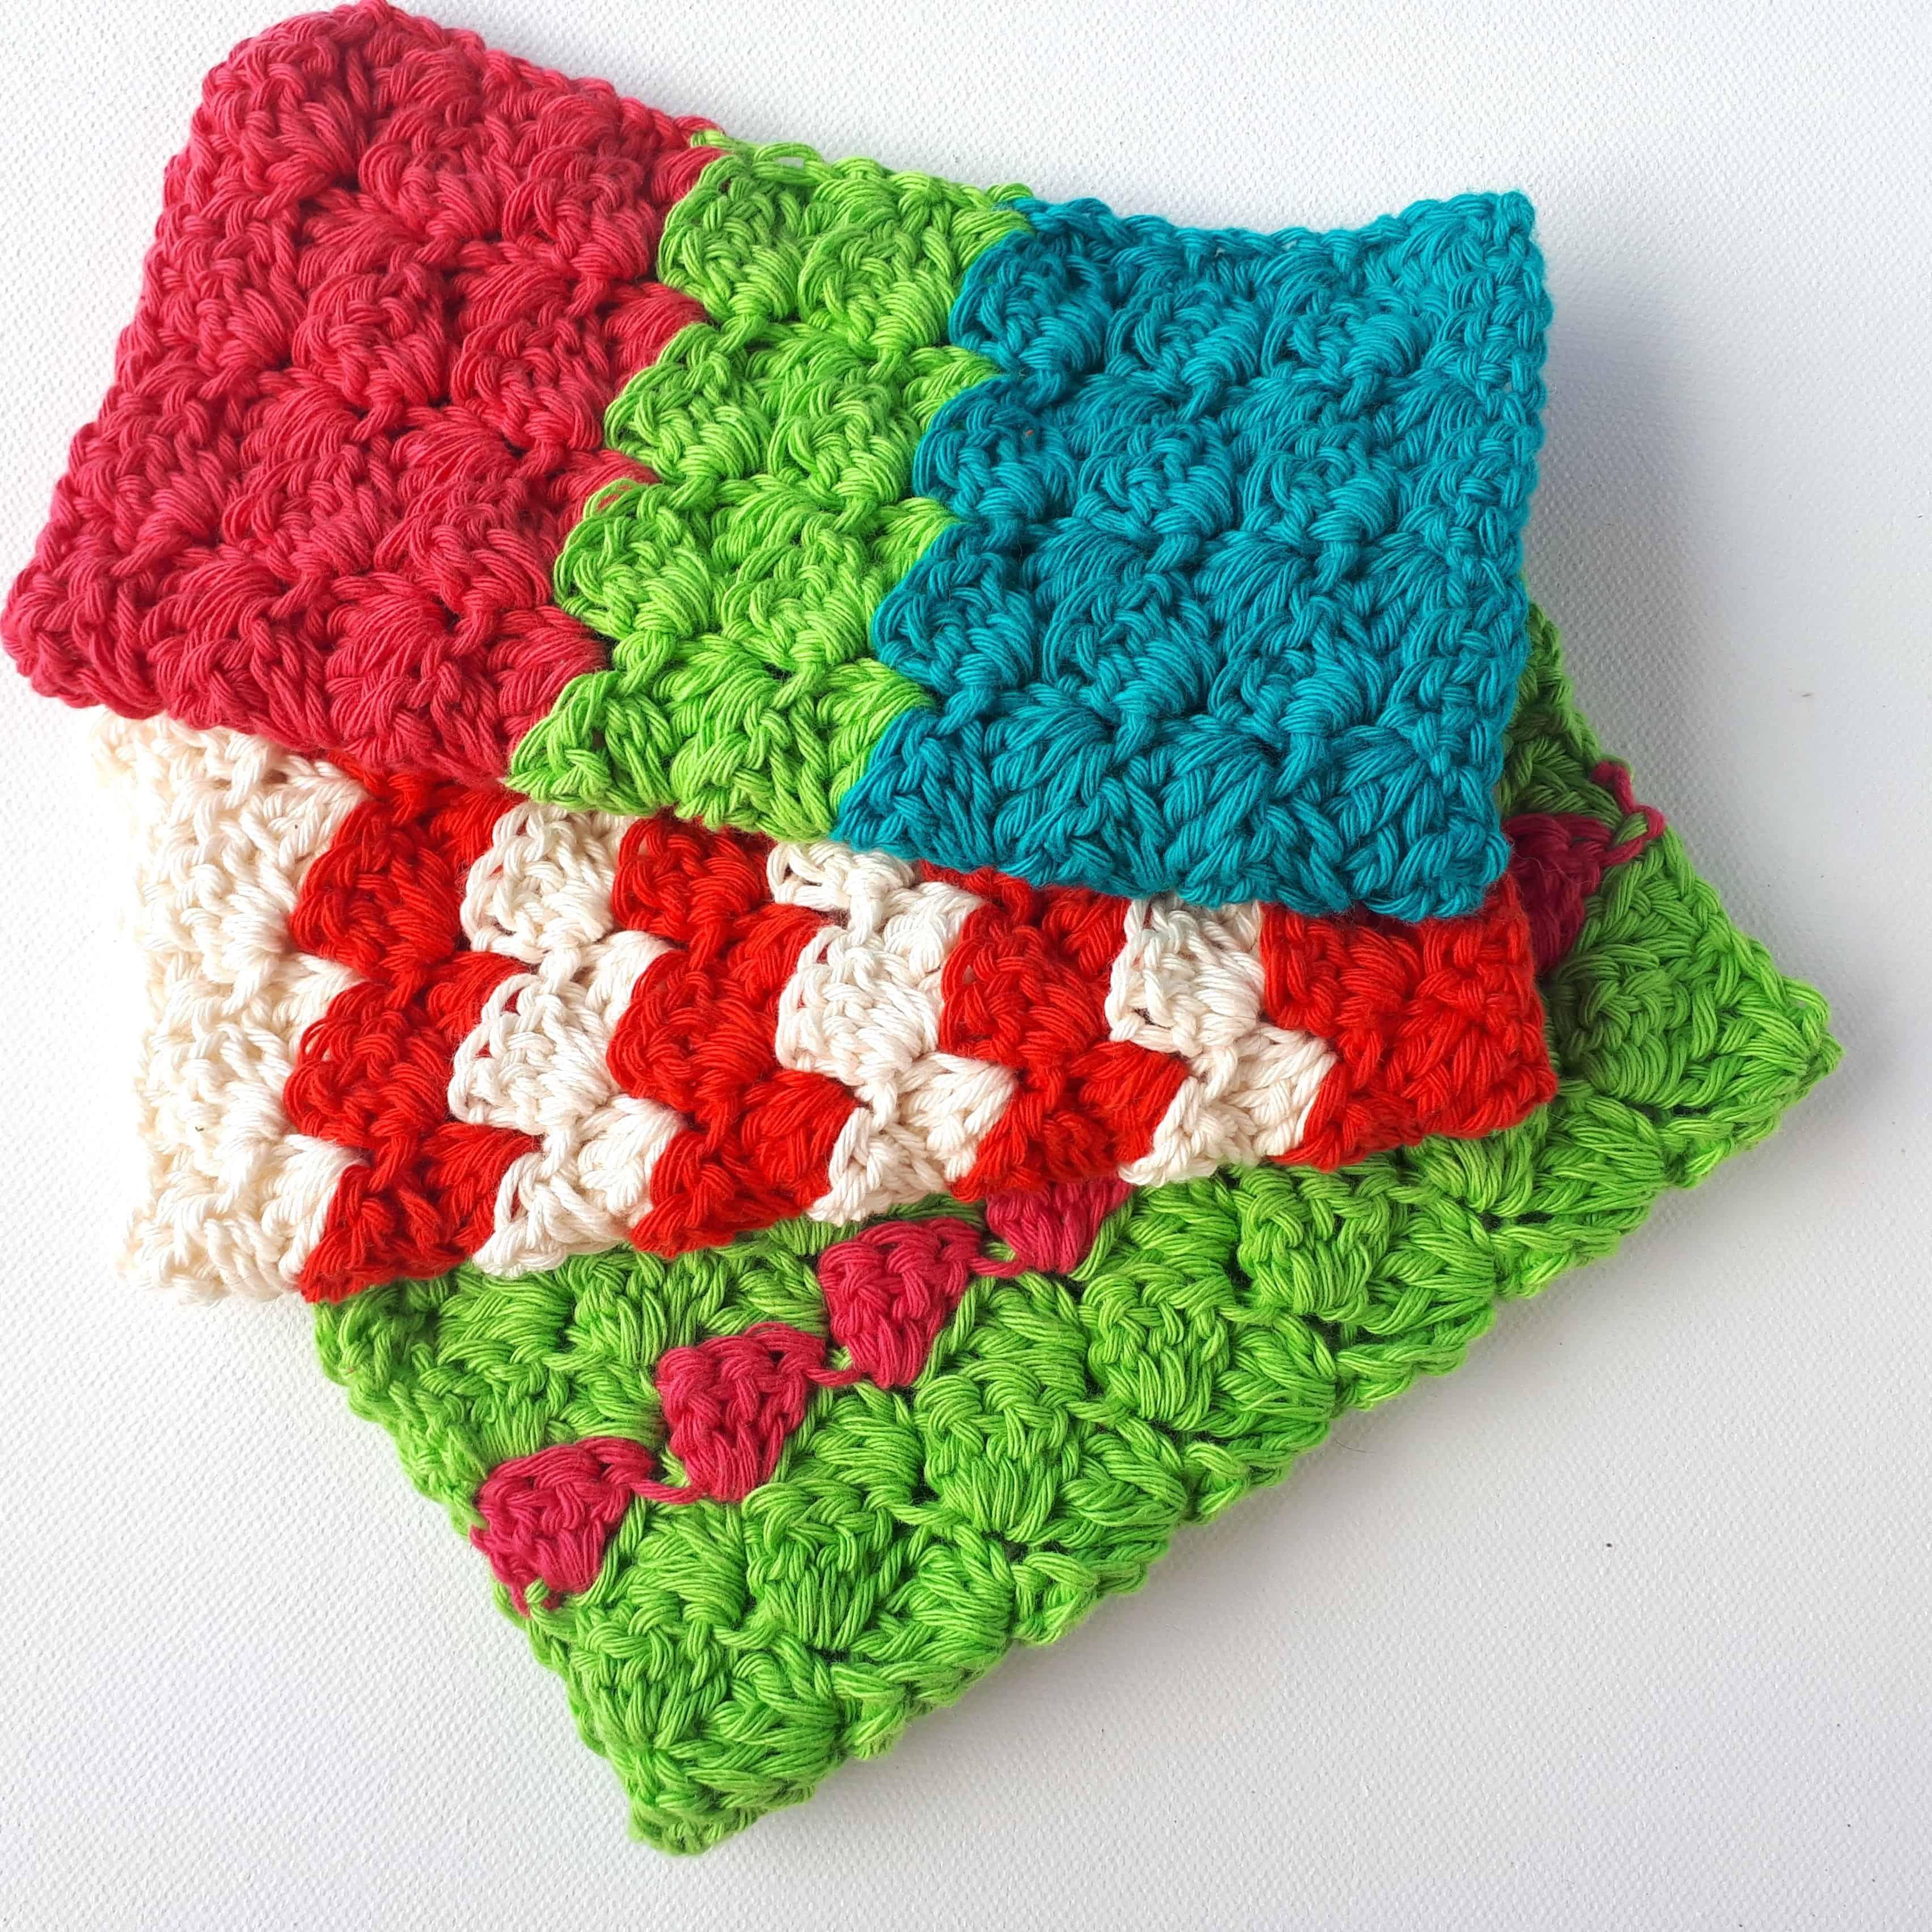 Cheery Crochet Dish Cloths Free Pattern Annie Design Crochet